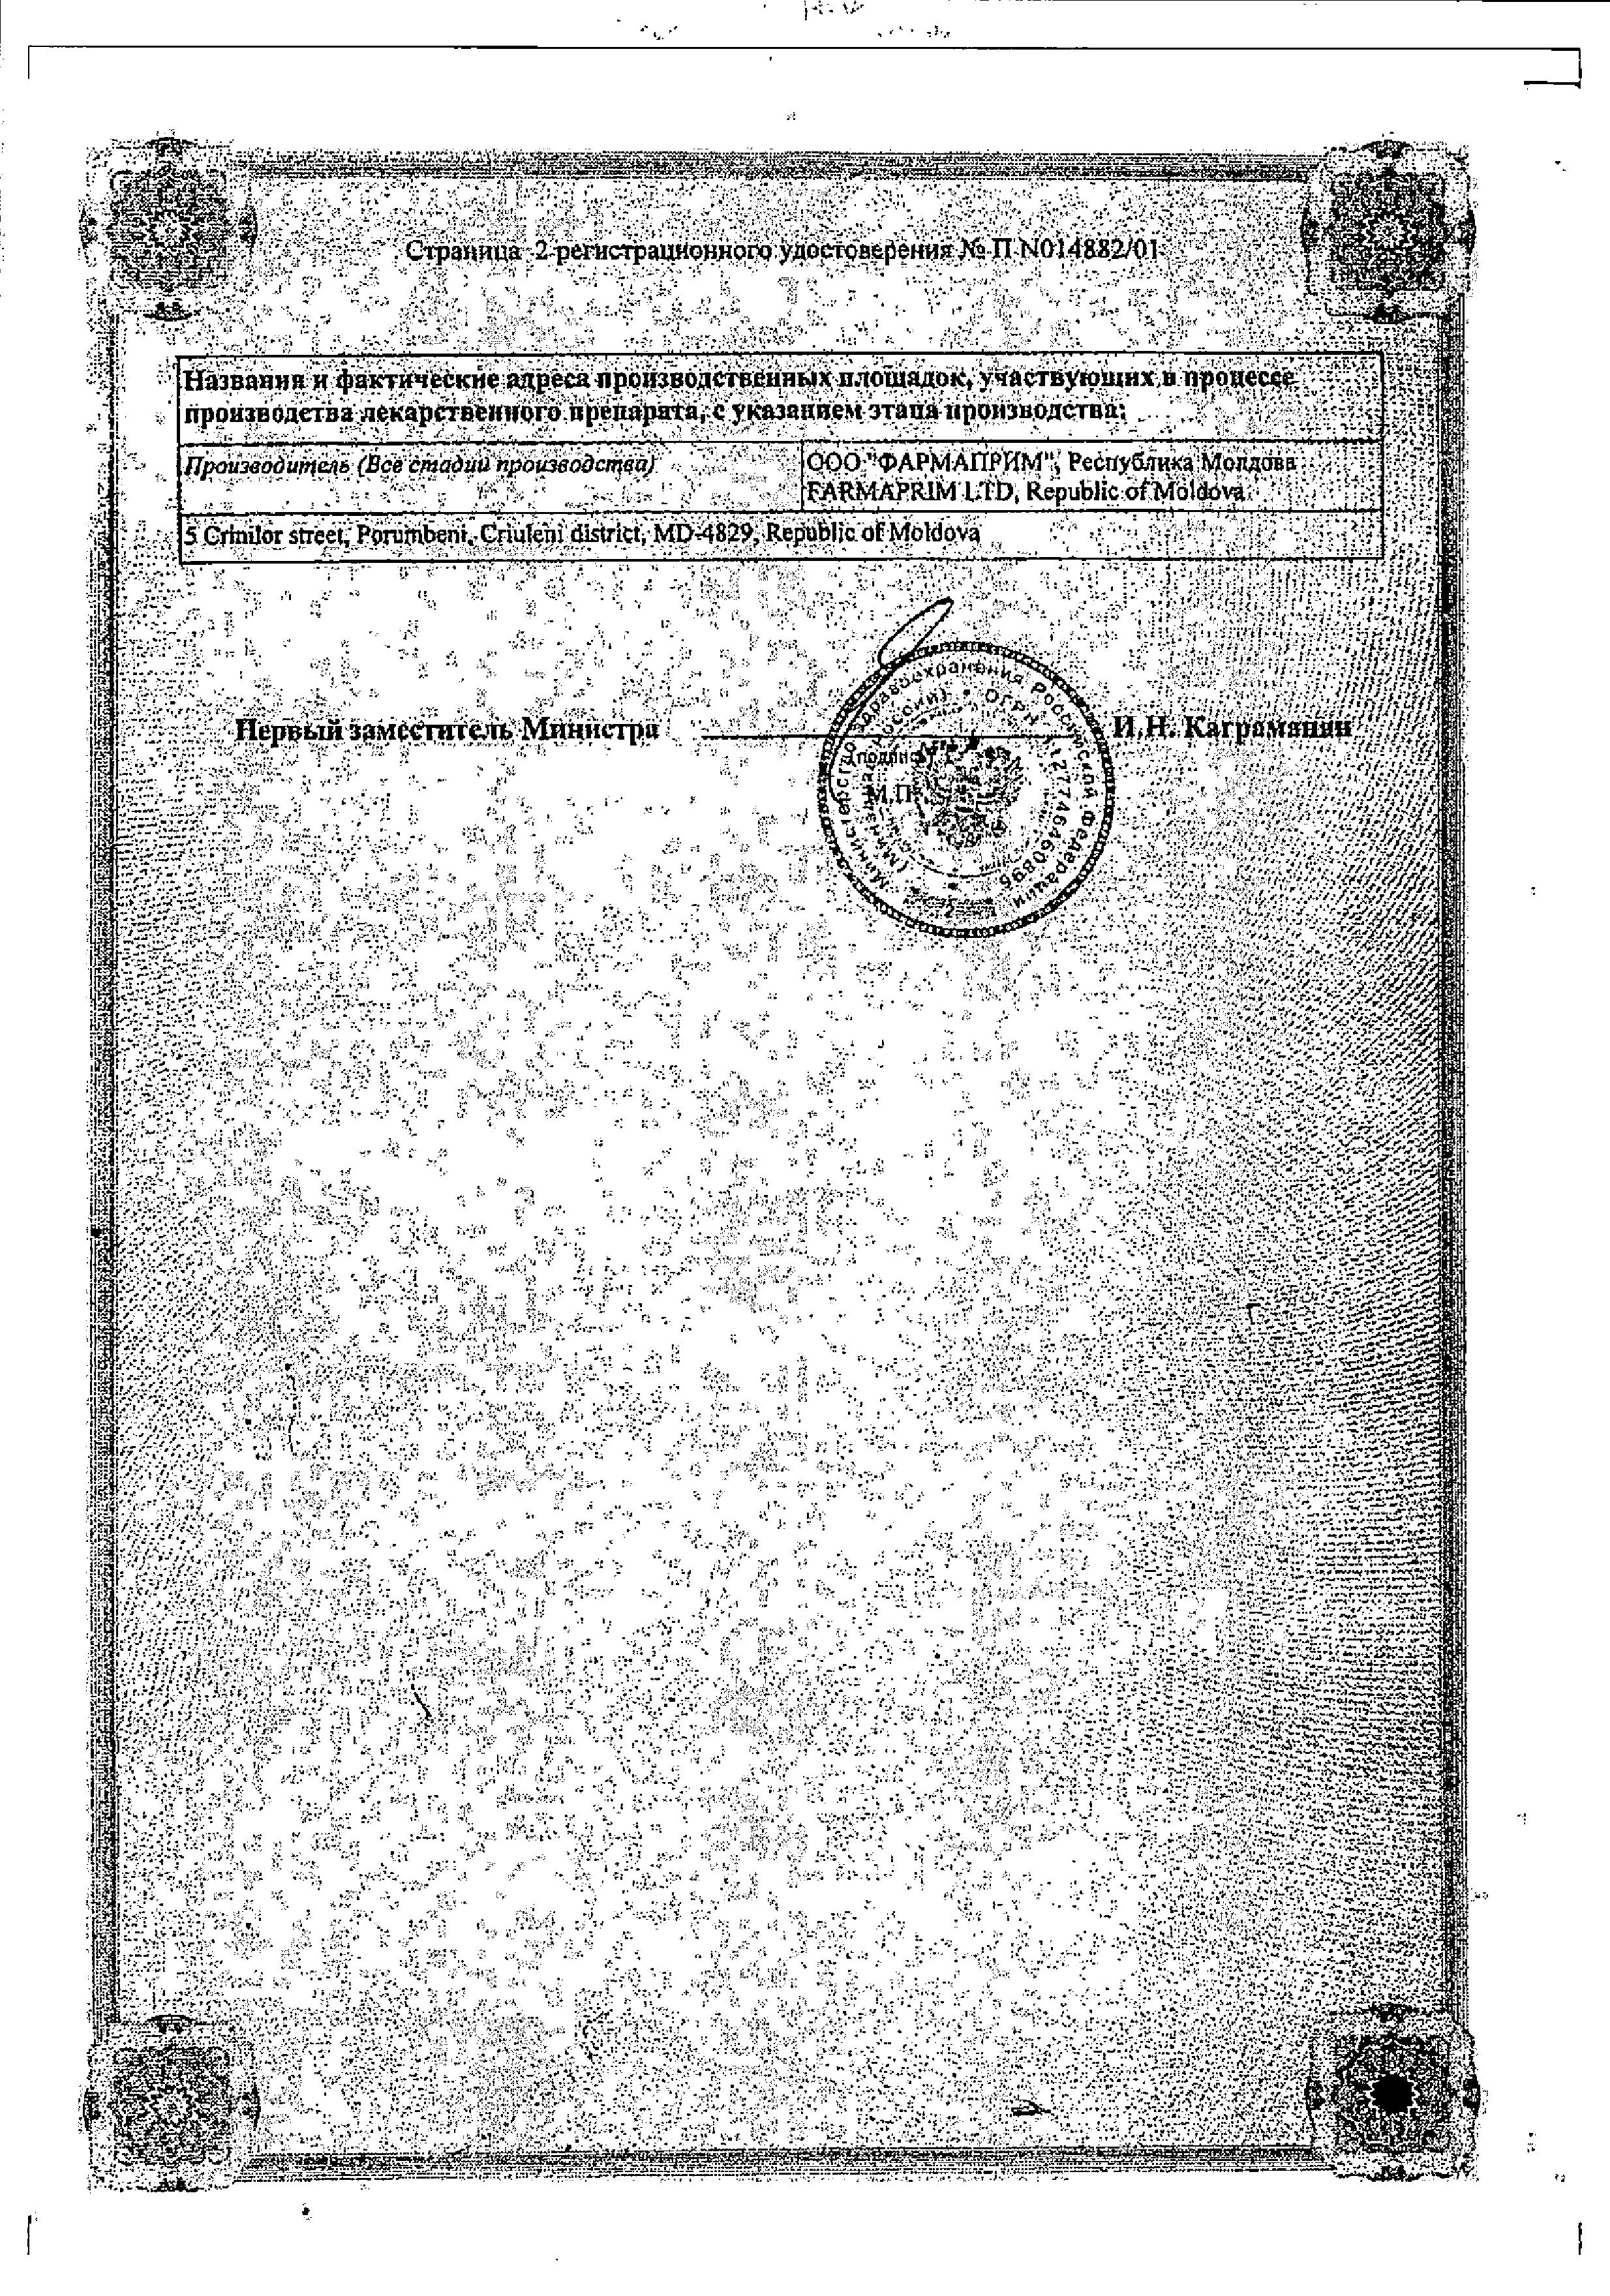 Облепиховое масло (свечи) сертификат